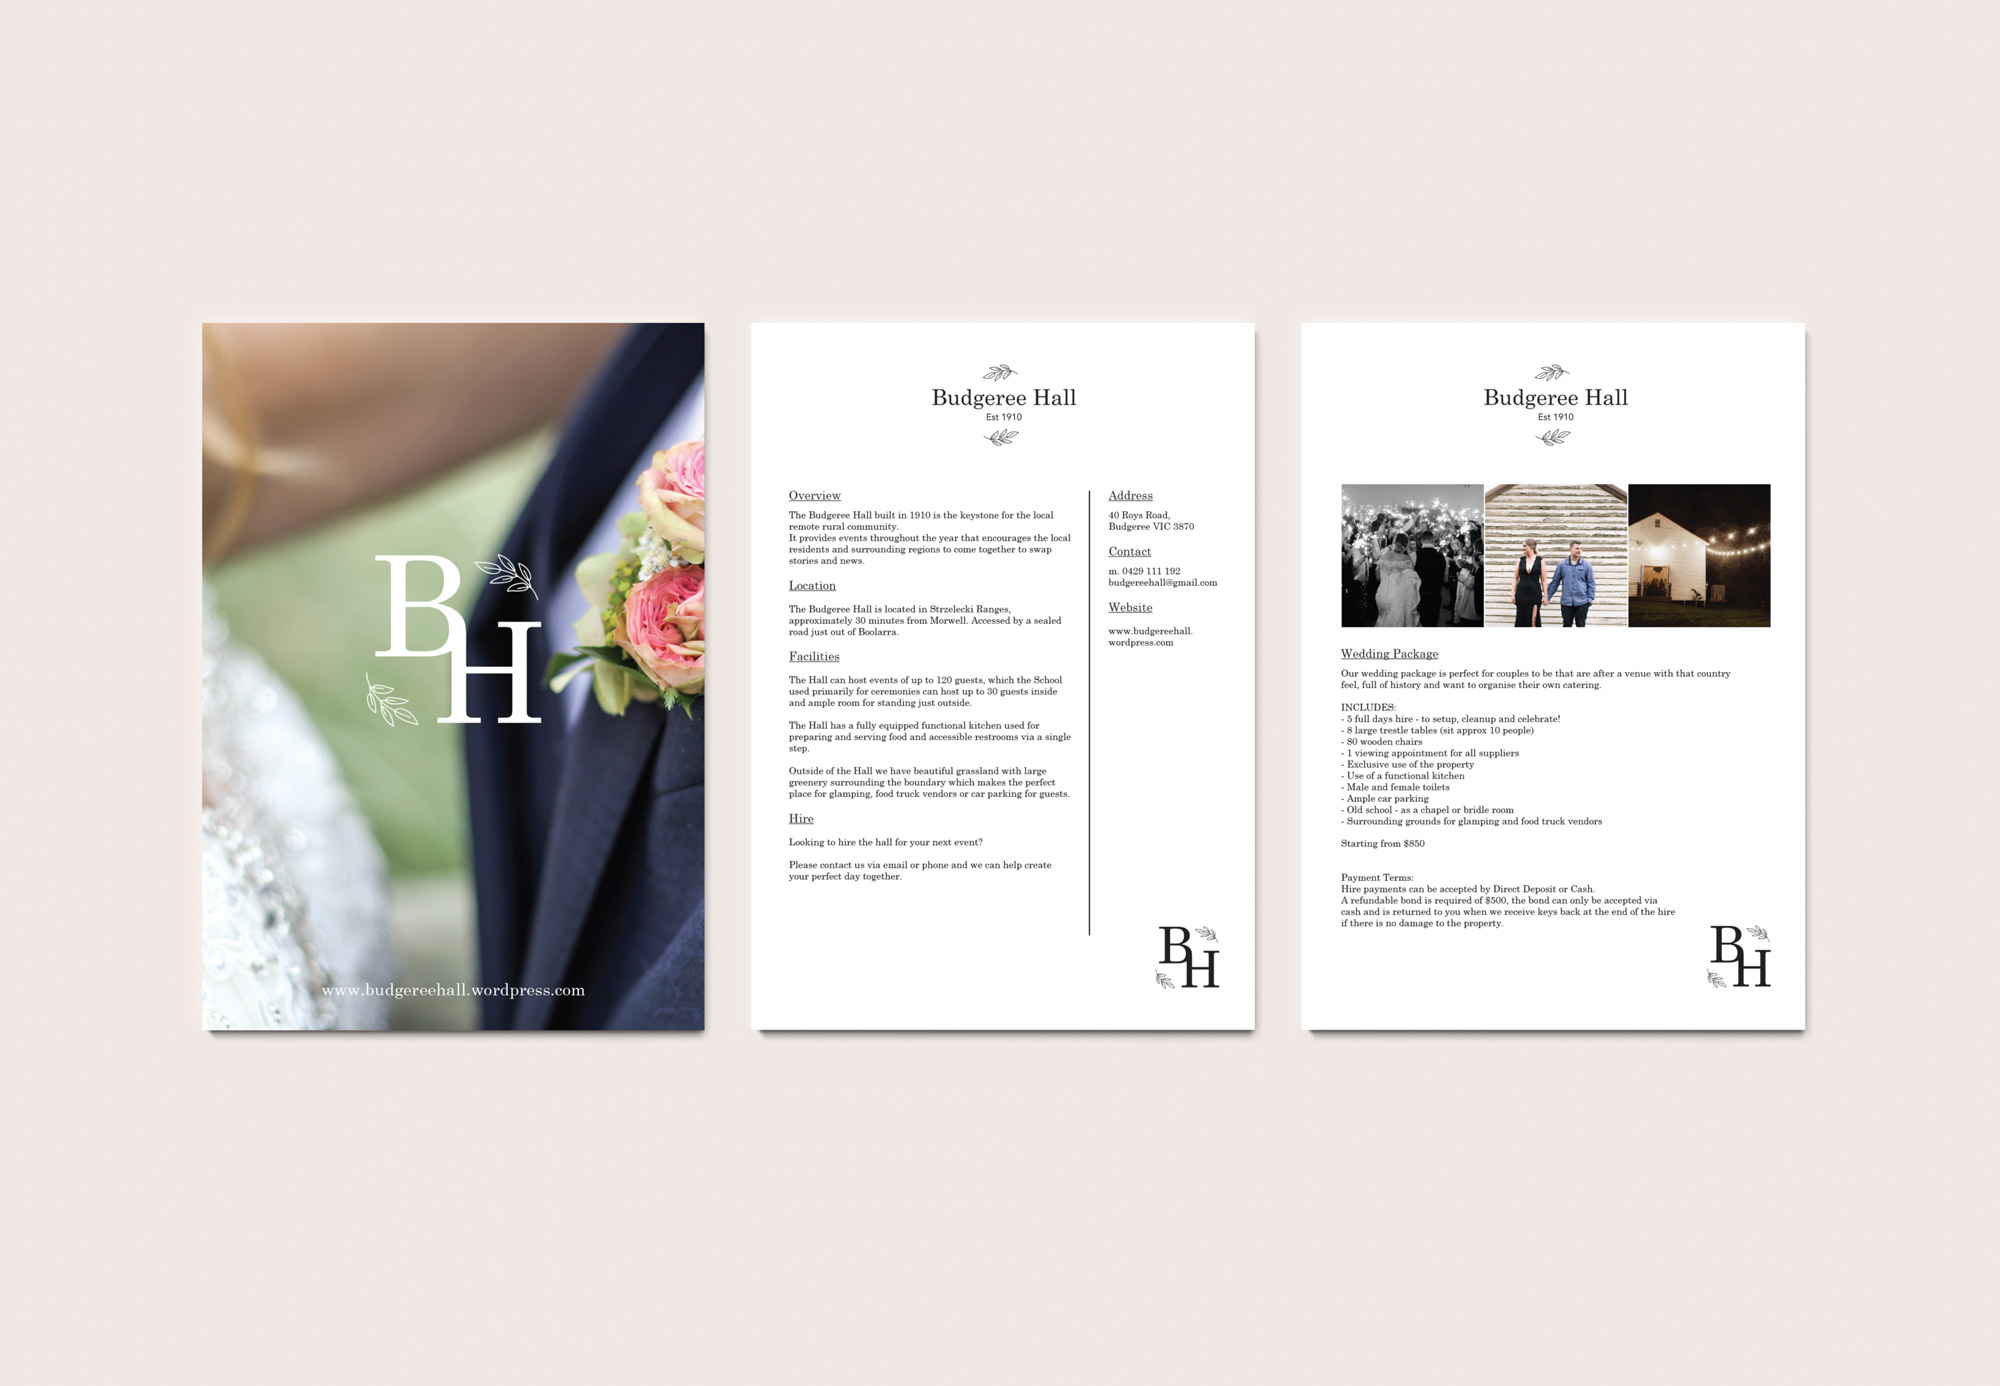 3Up-A4-Branding-Mockup-wedding